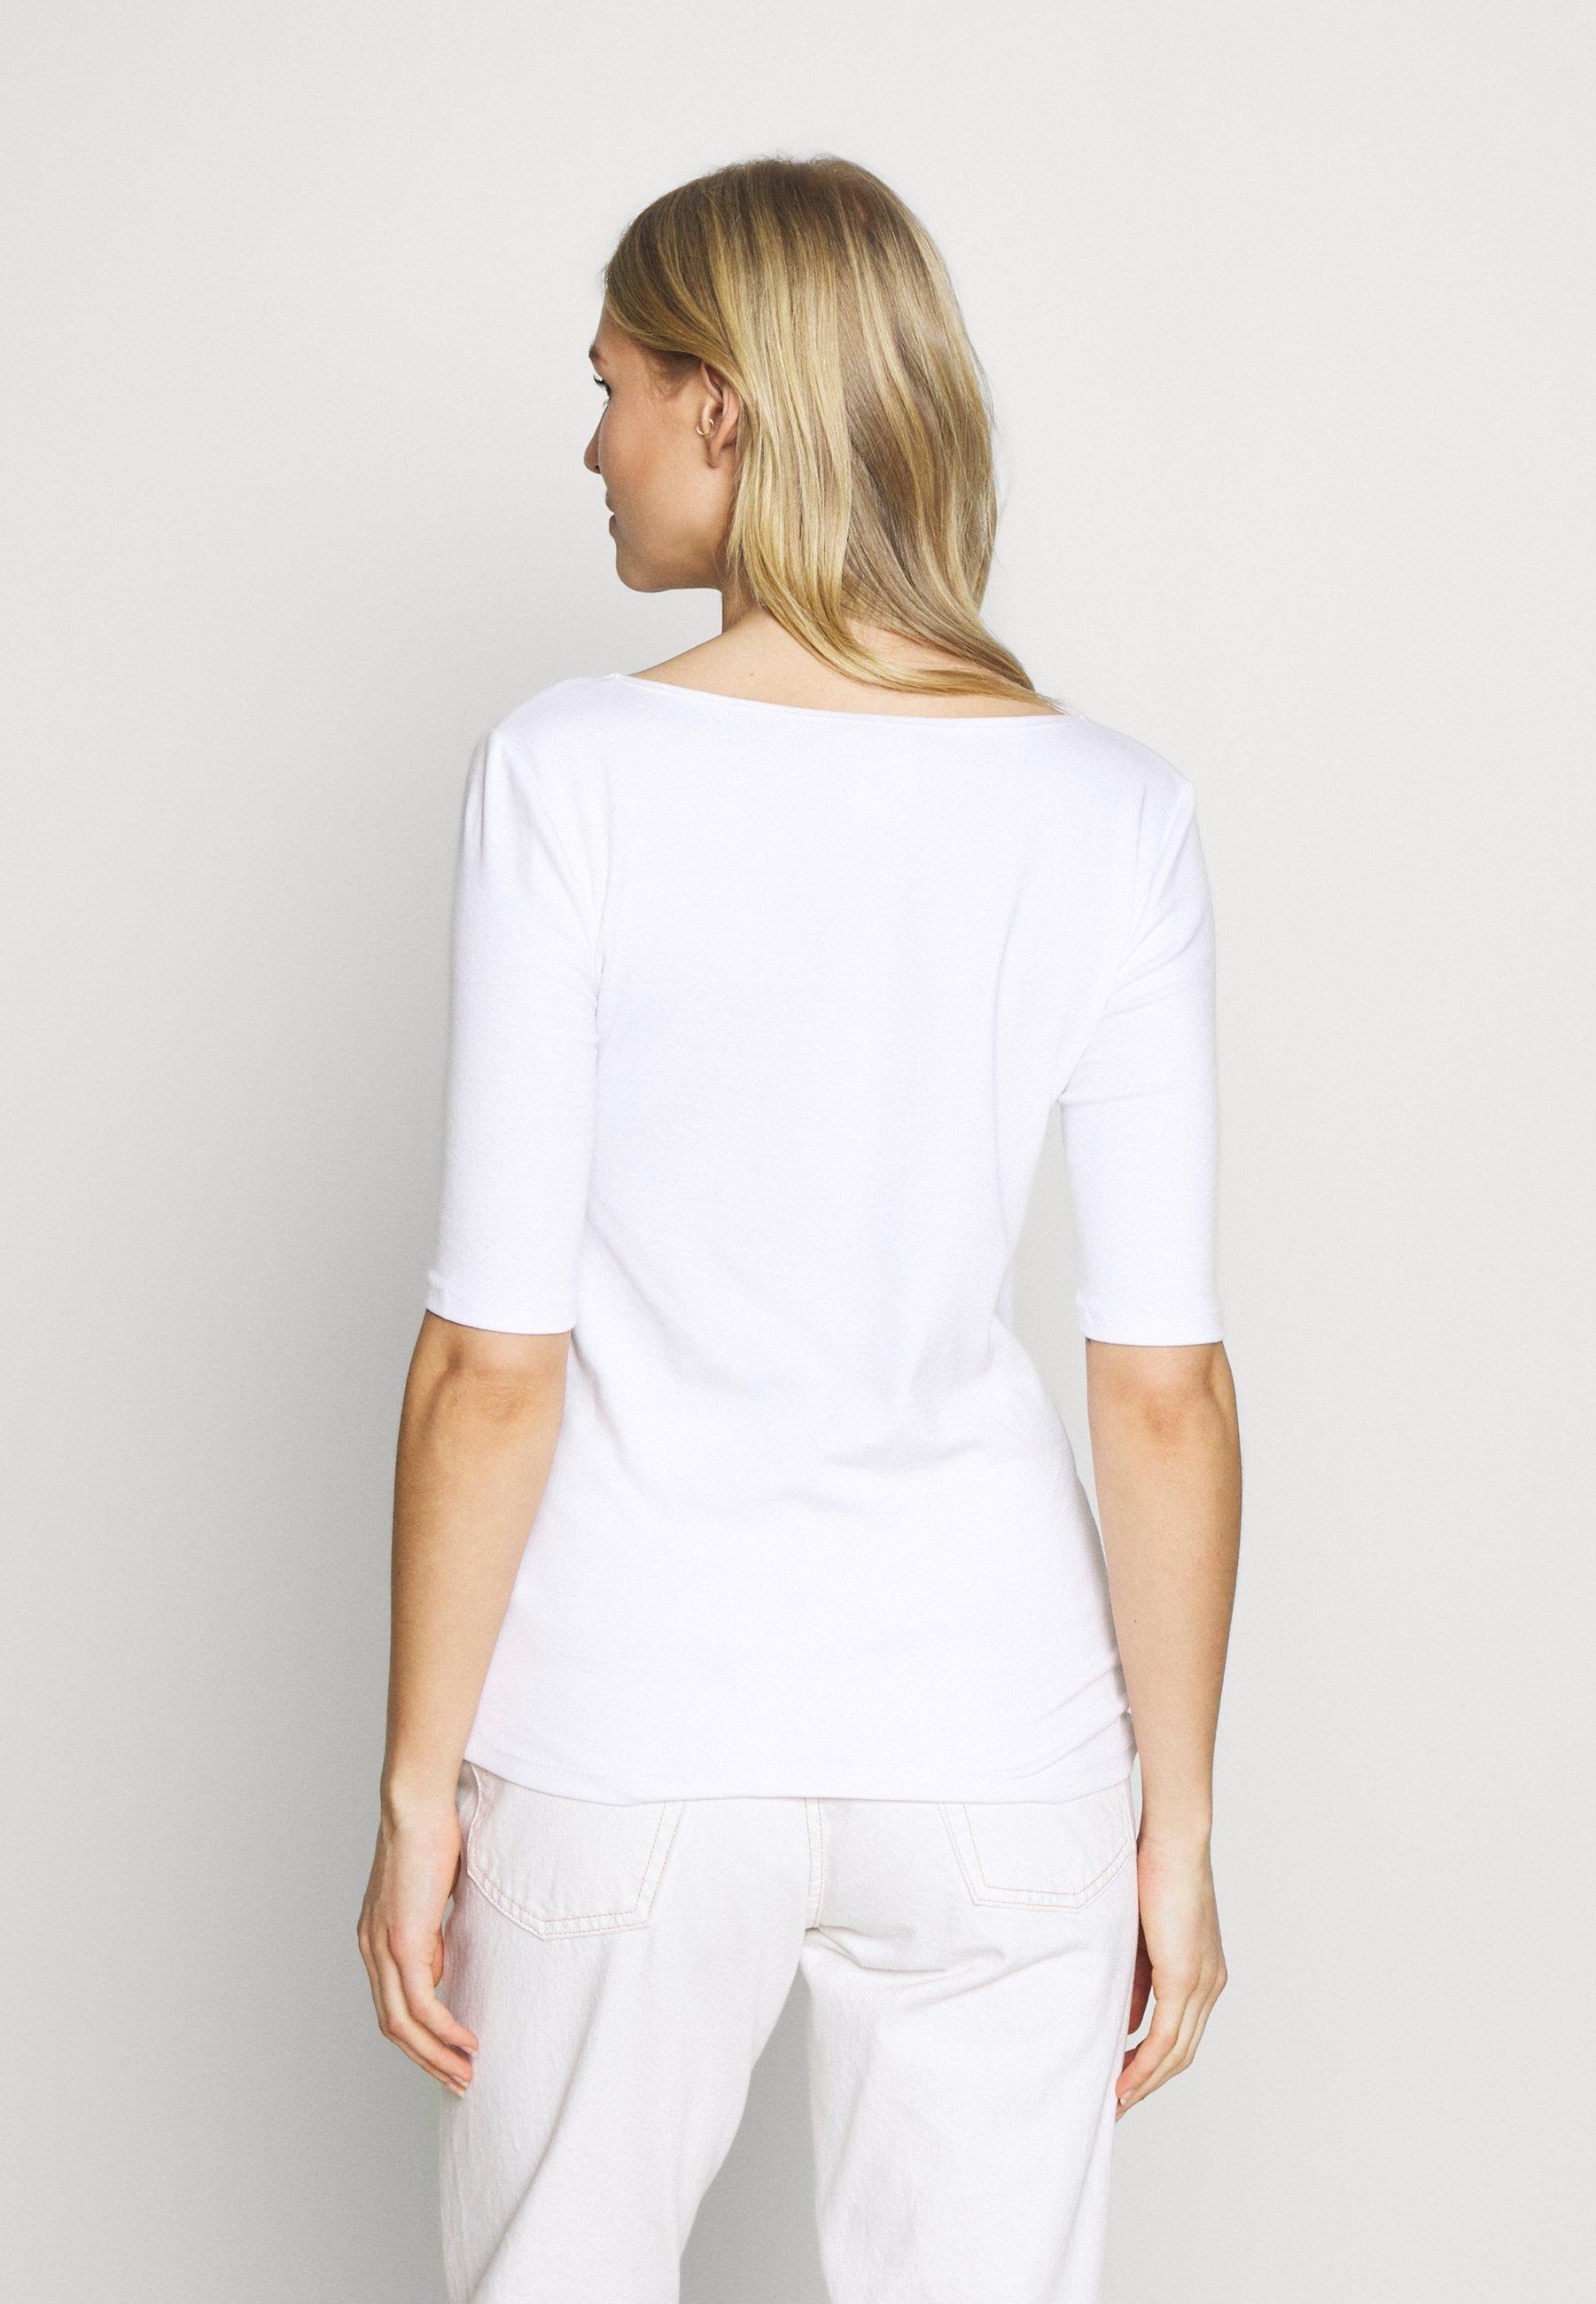 GAP T-shirts - optic white